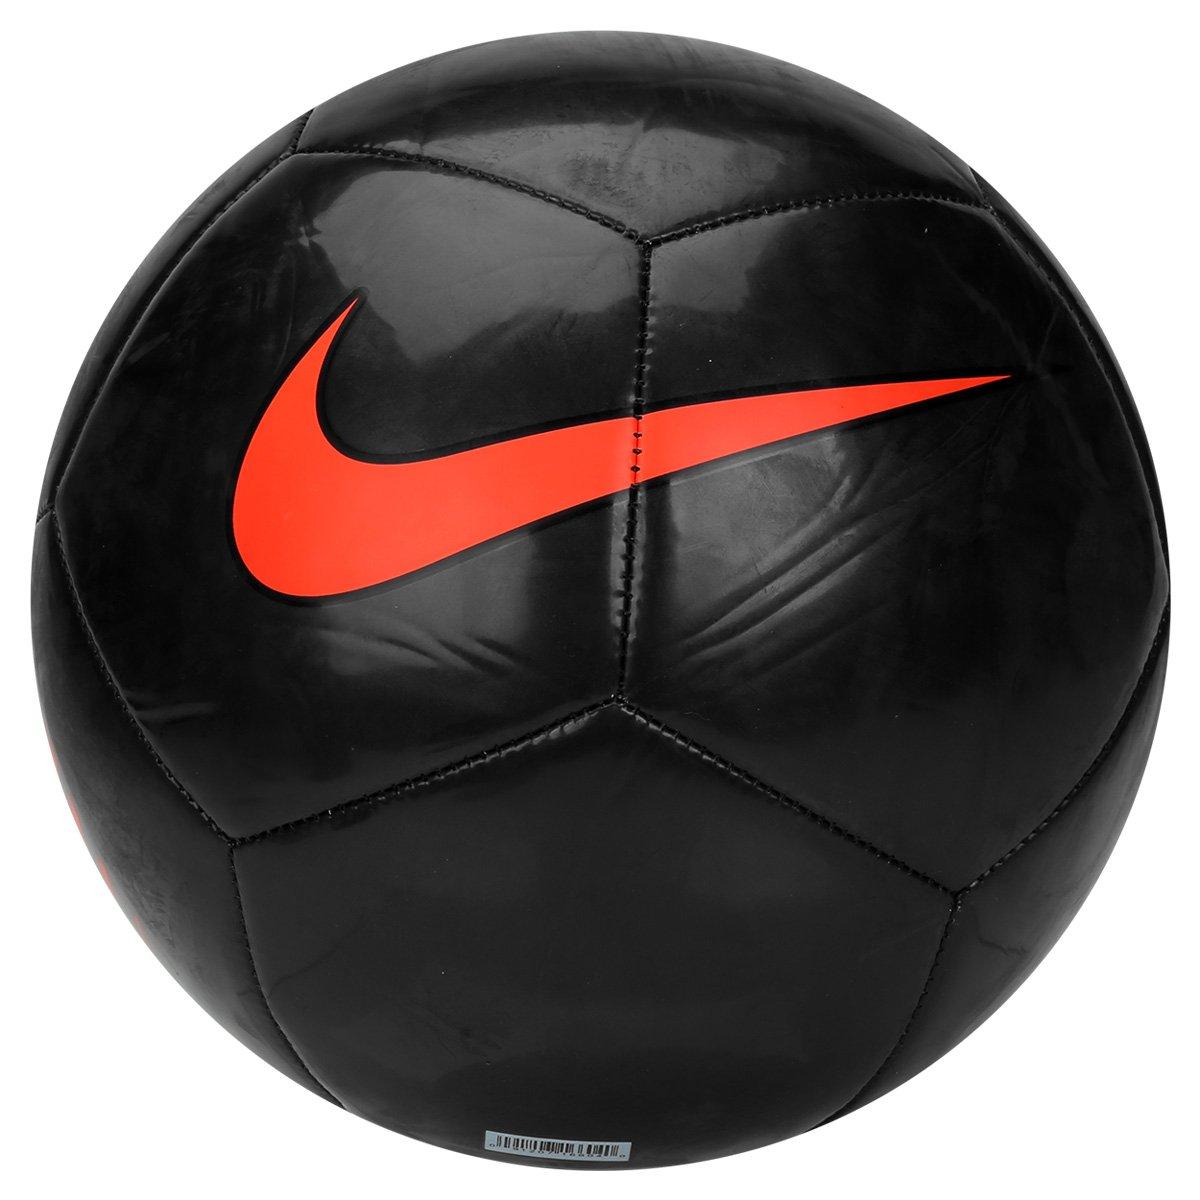 Bola Futebol Campo Nike Pitch Trainning - Preto e Laranja - Compre ... 0709044ff6598